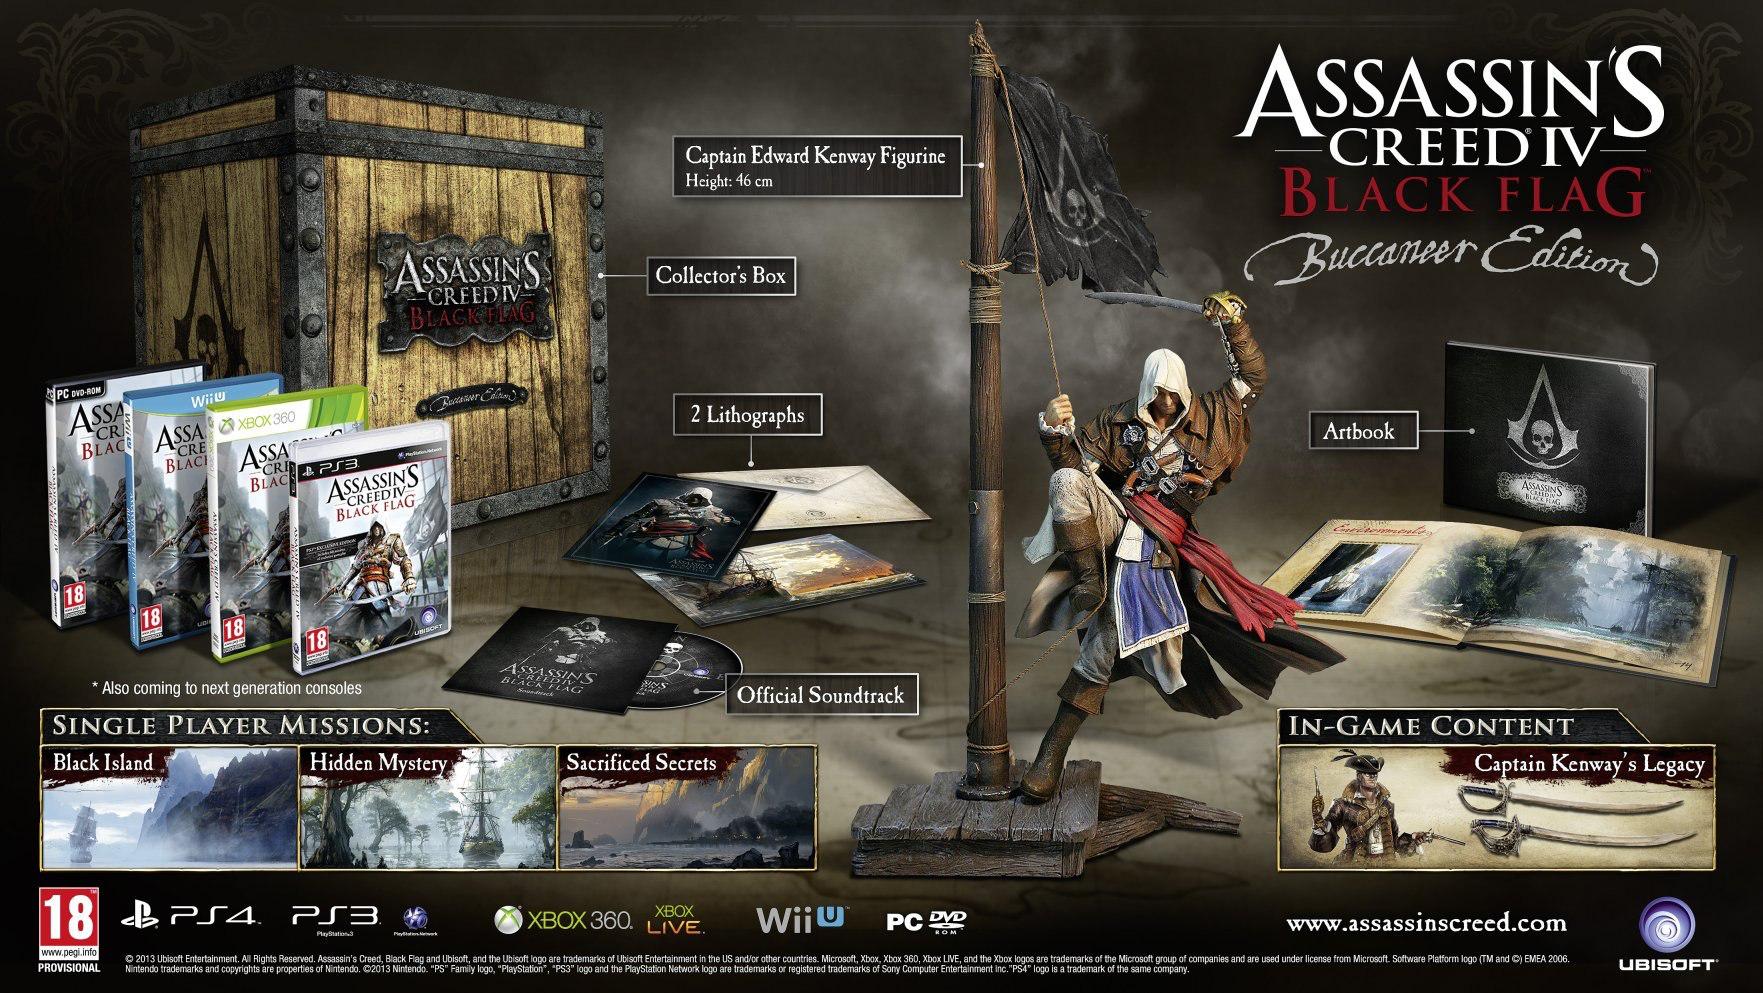 Assassin's Creed 4 Black Flag Edition Buccaneer + Drapeau Exclu sur PS3